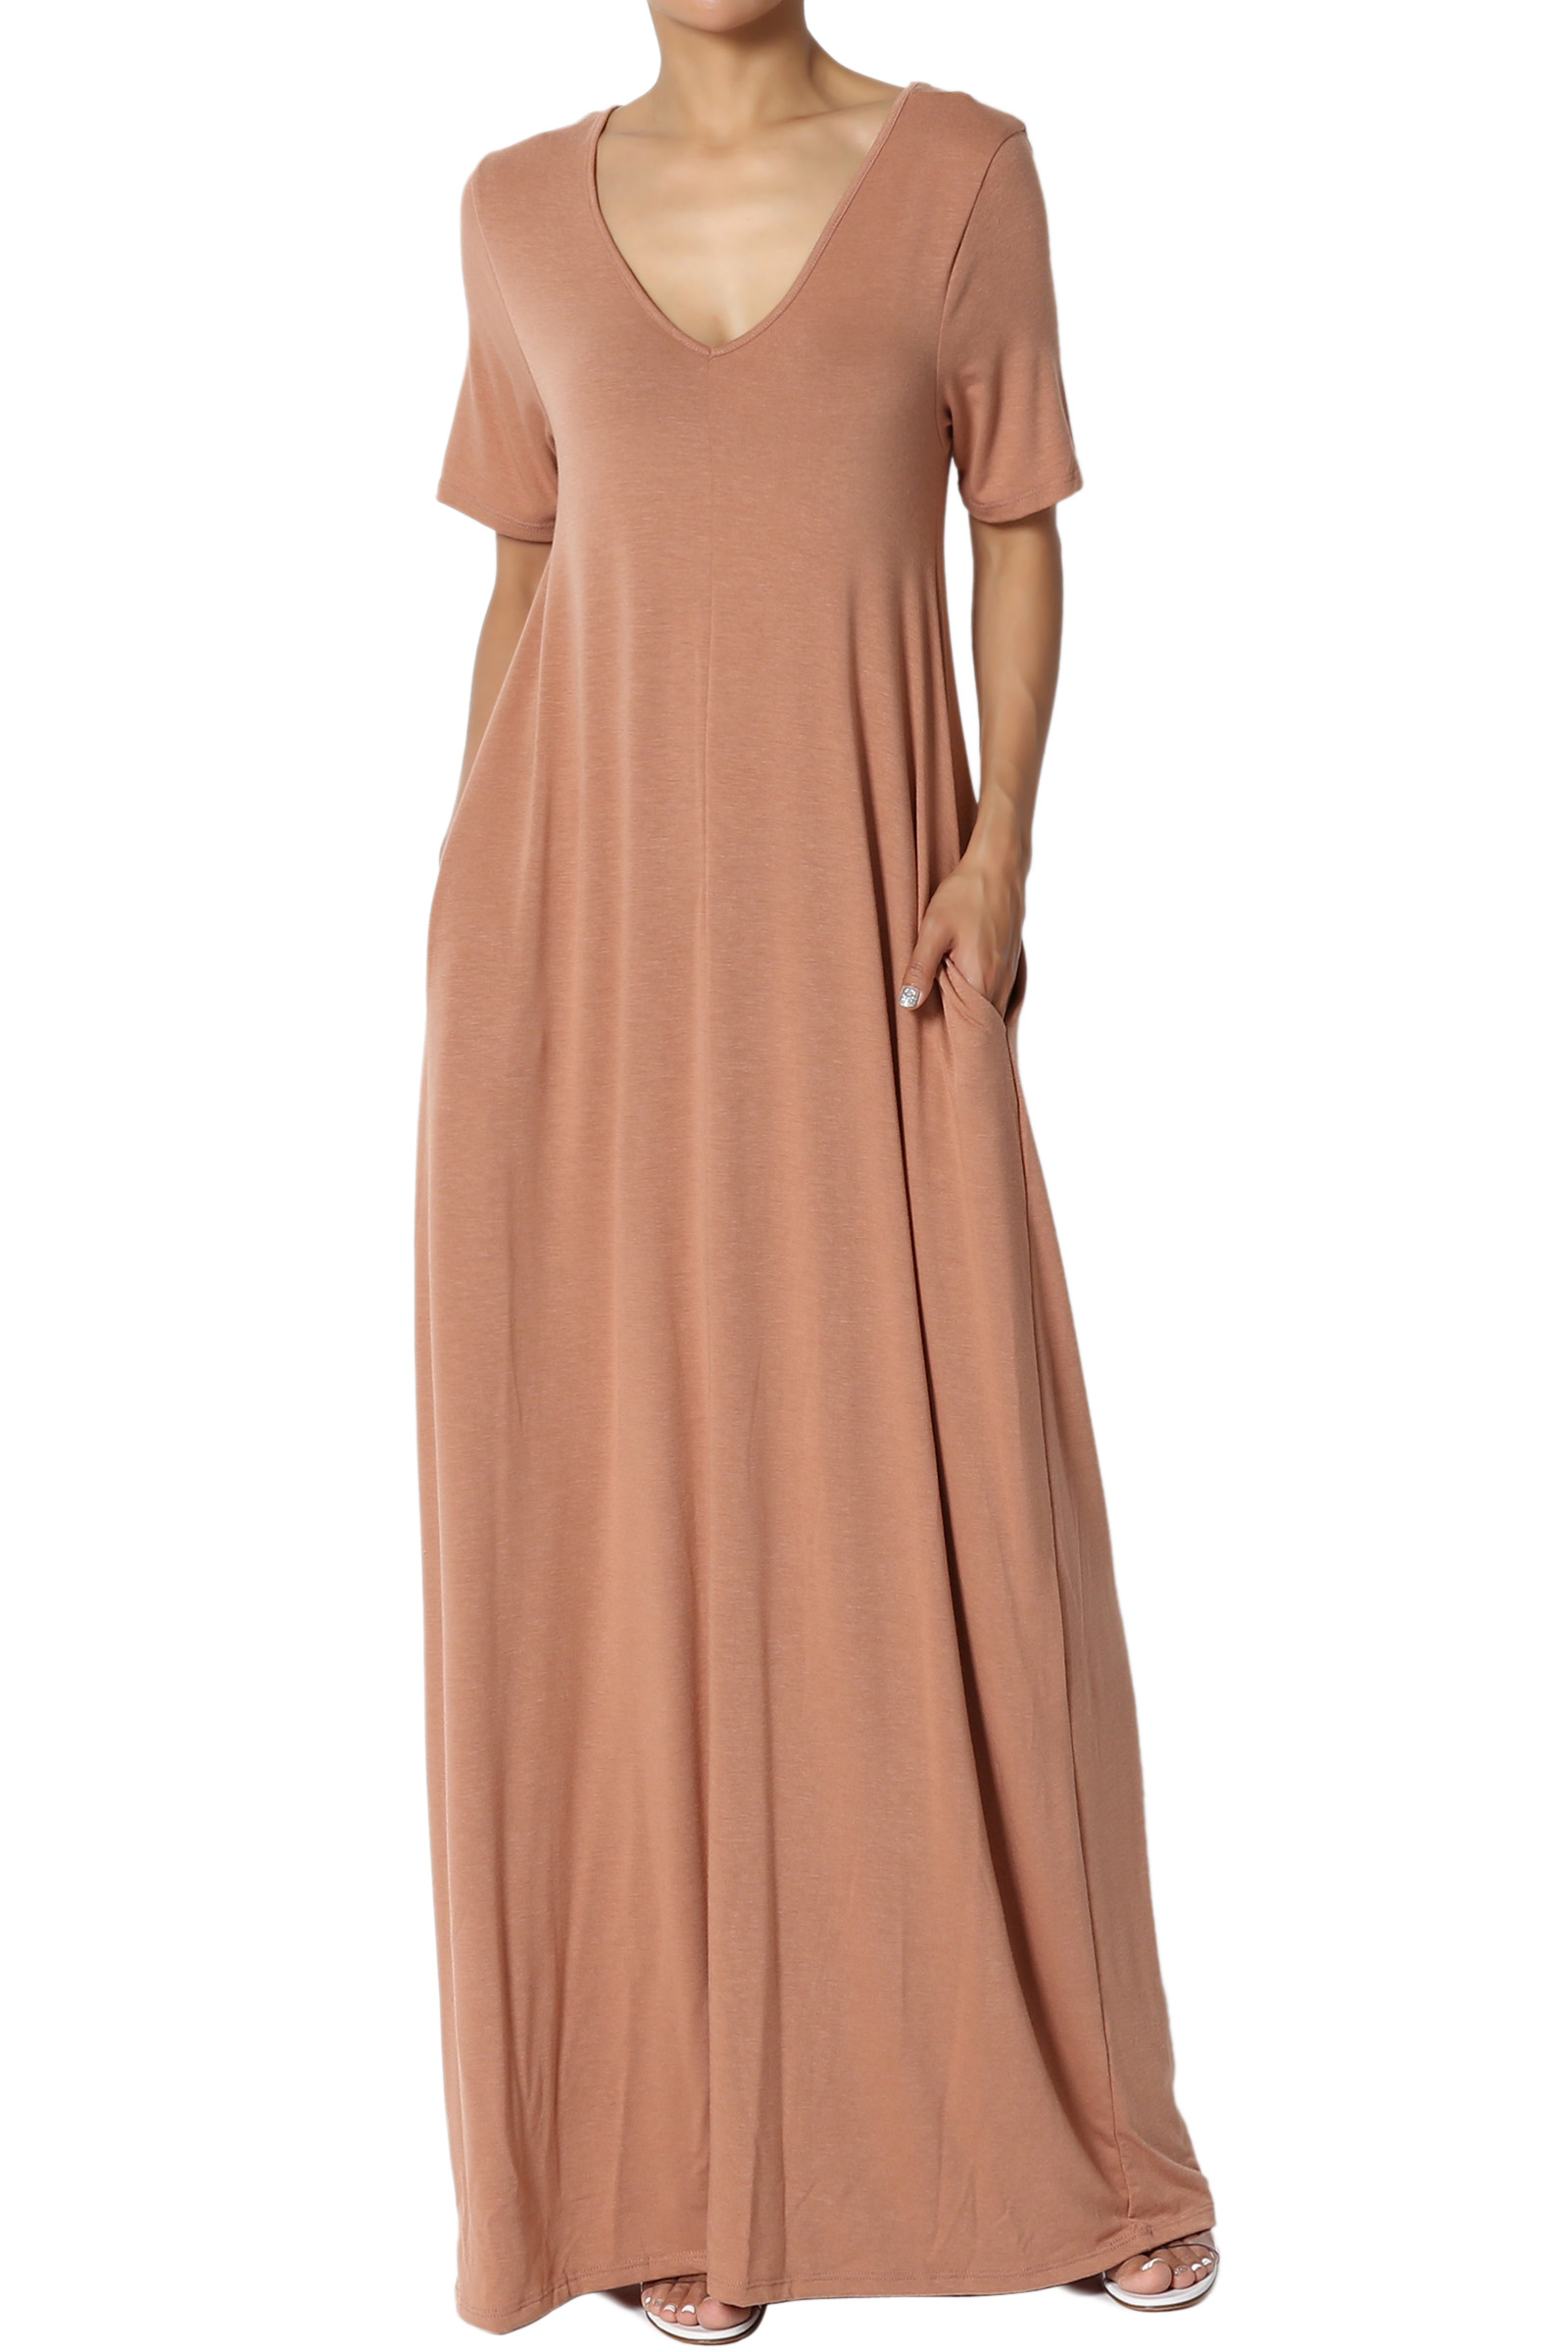 TheMogan S~3X 1//2 Short Sleeve Shirred Viscose Jersey Round Neck Long Maxi Dress